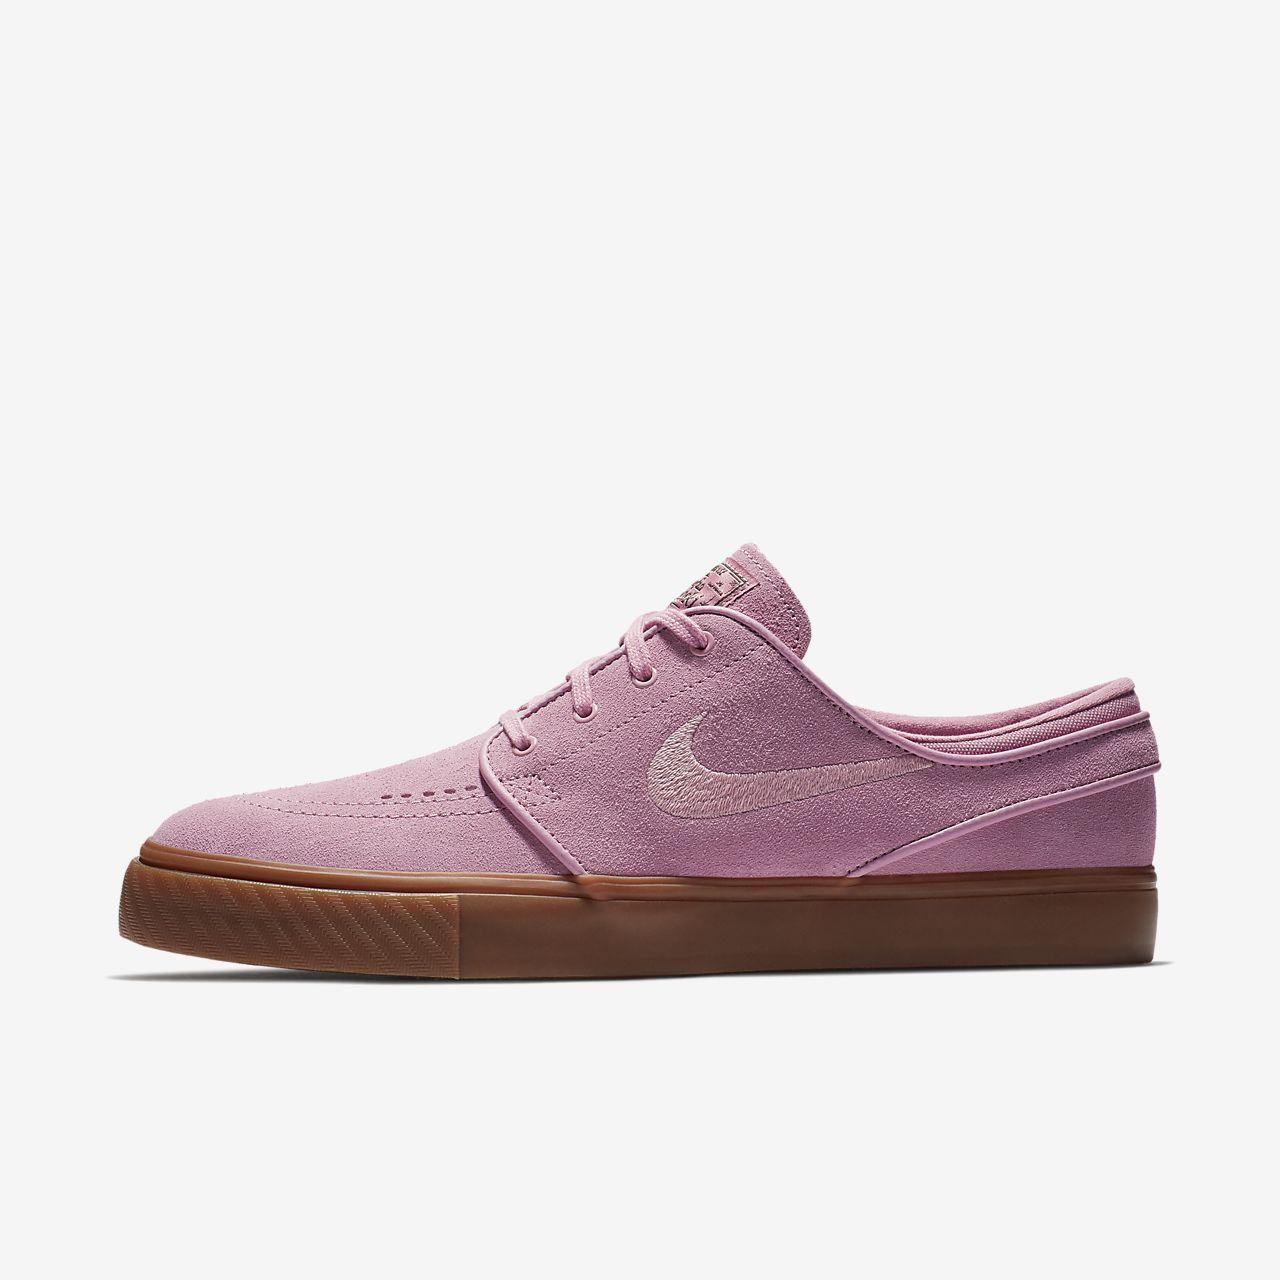 333824 604 Nike Sb Zoom Stefan Janoski Elemental Rosa